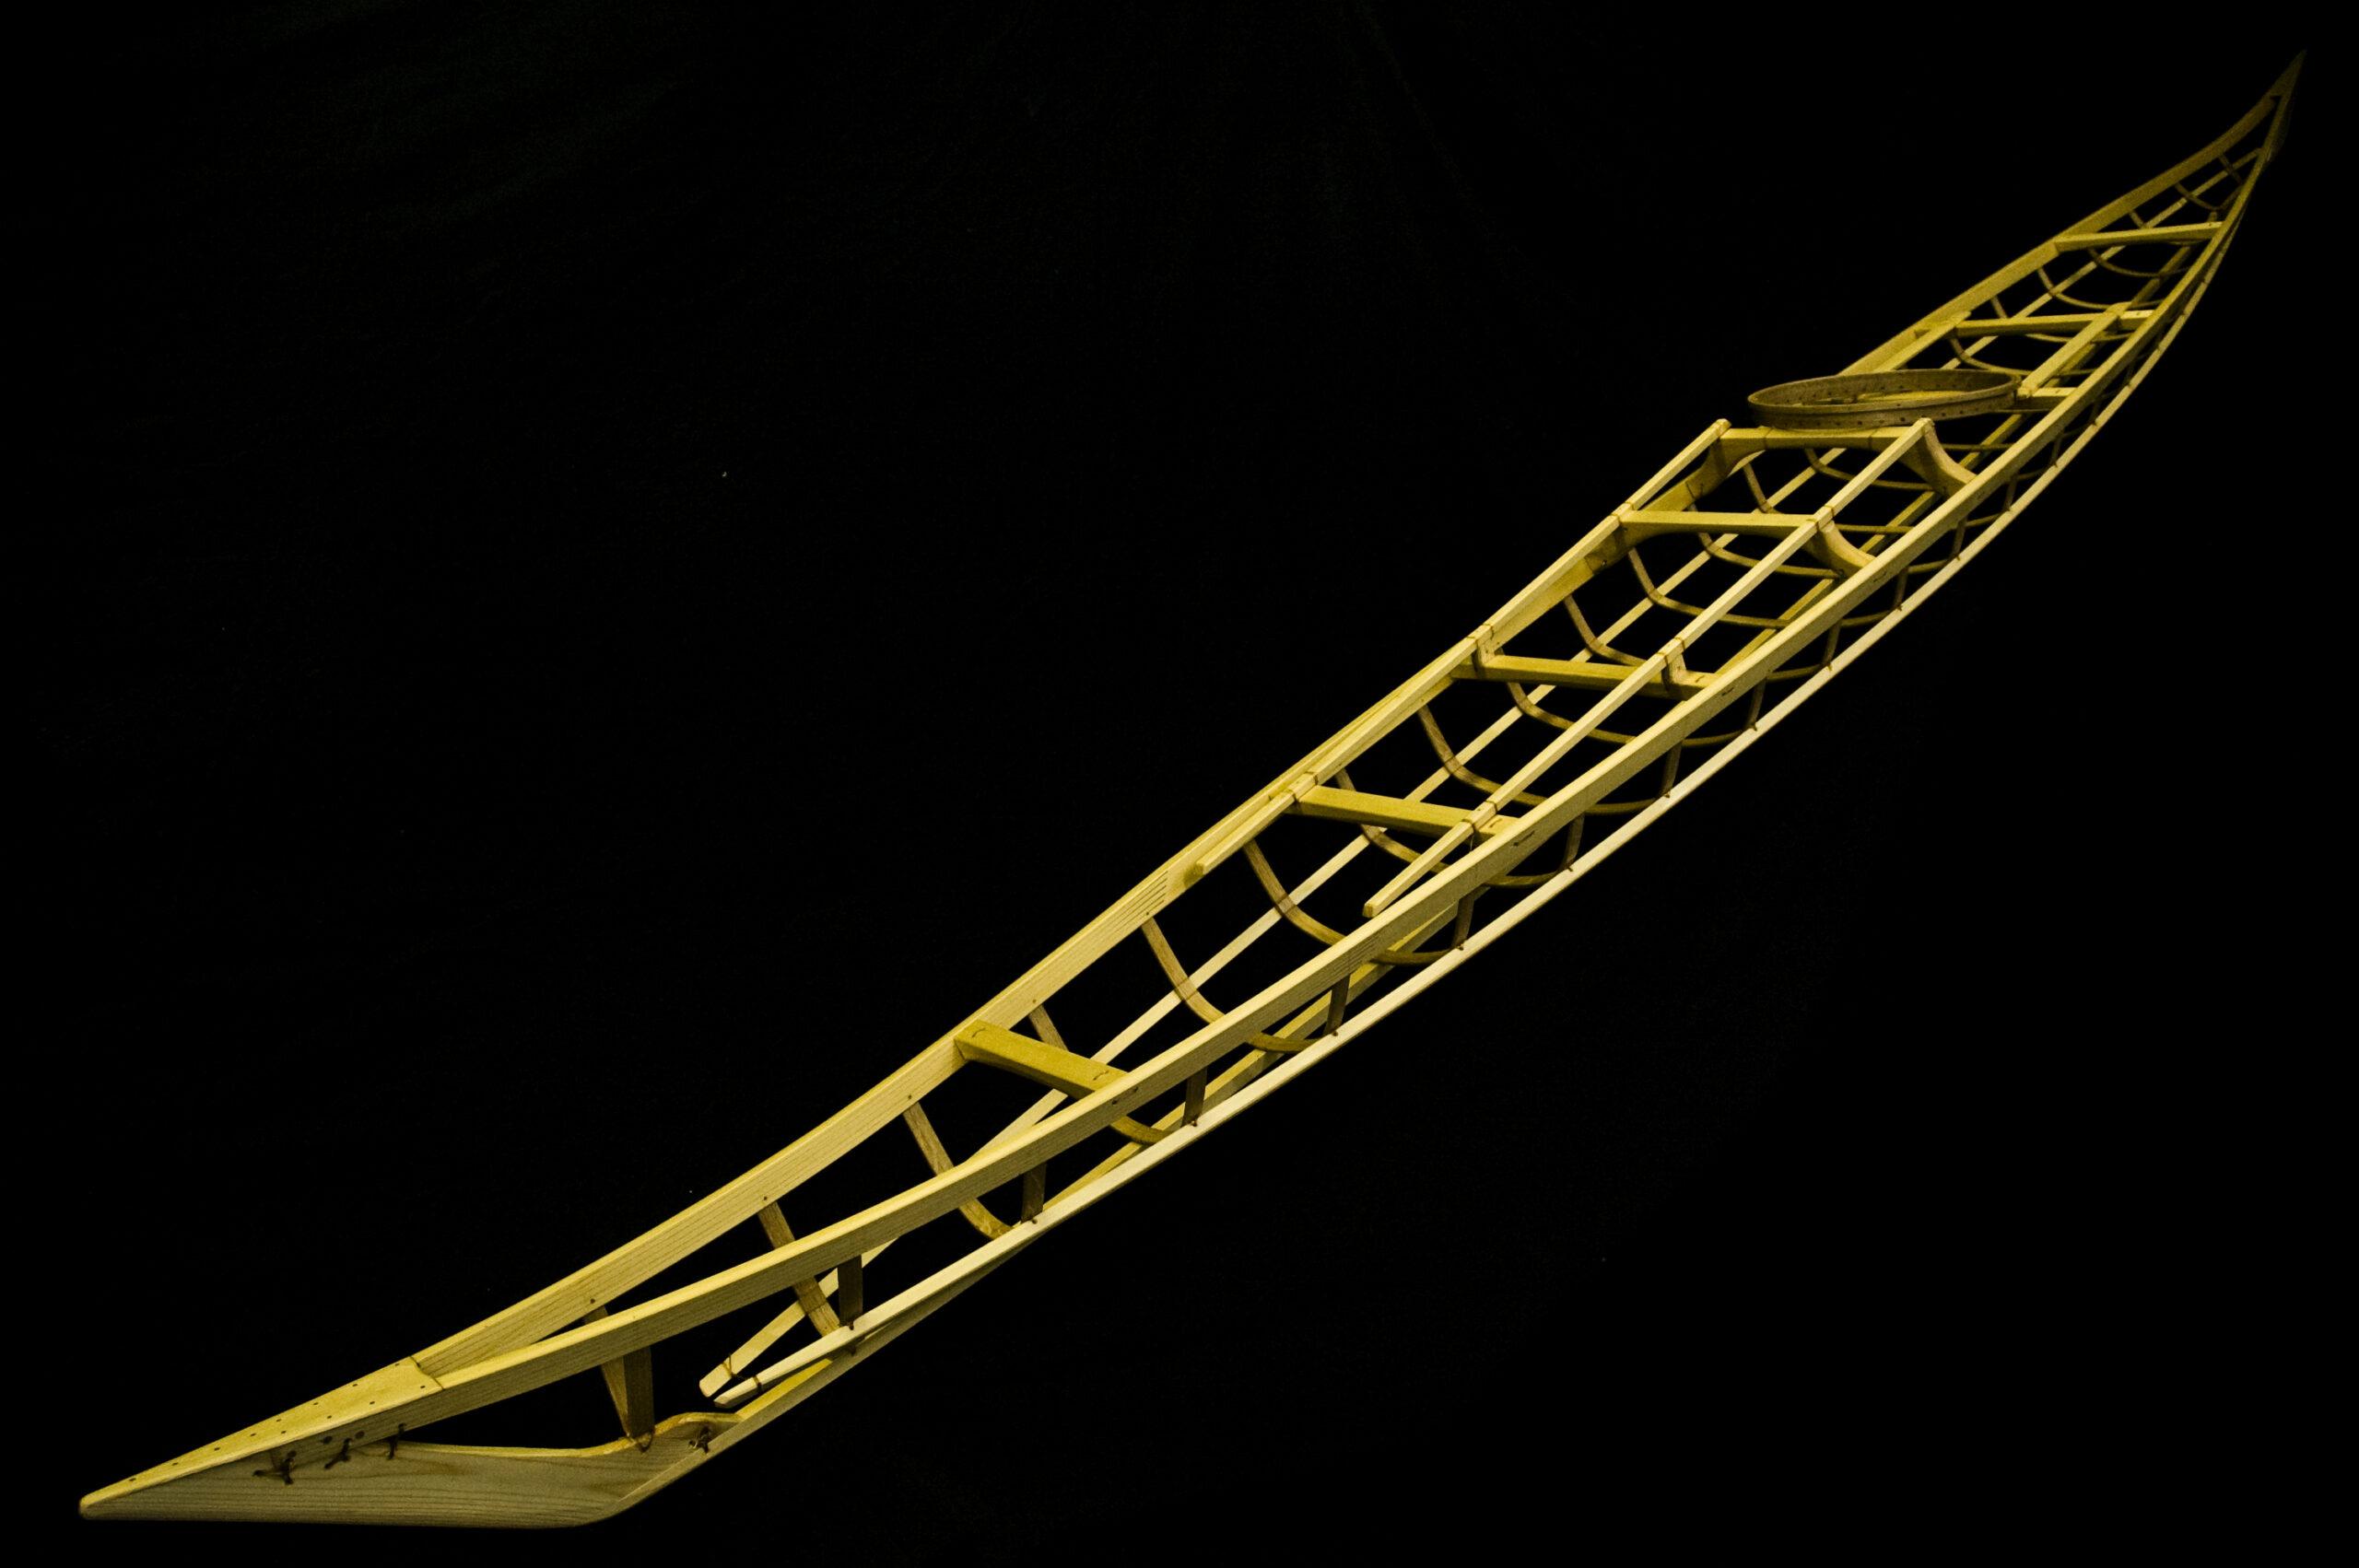 Wooden Kayak frame by Nick Schade